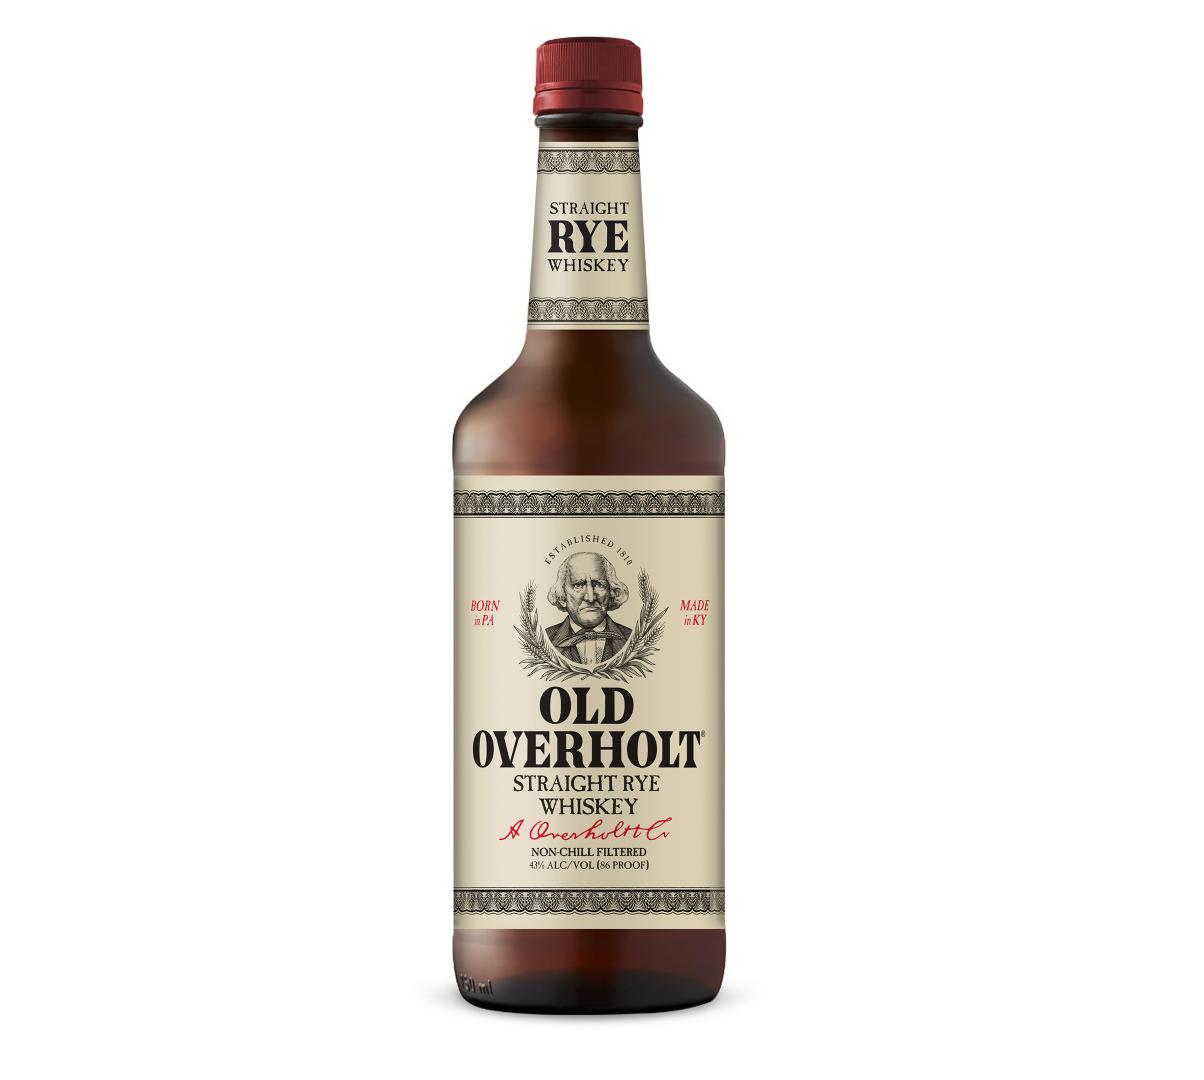 Old Overholt Straight Rye (2020)